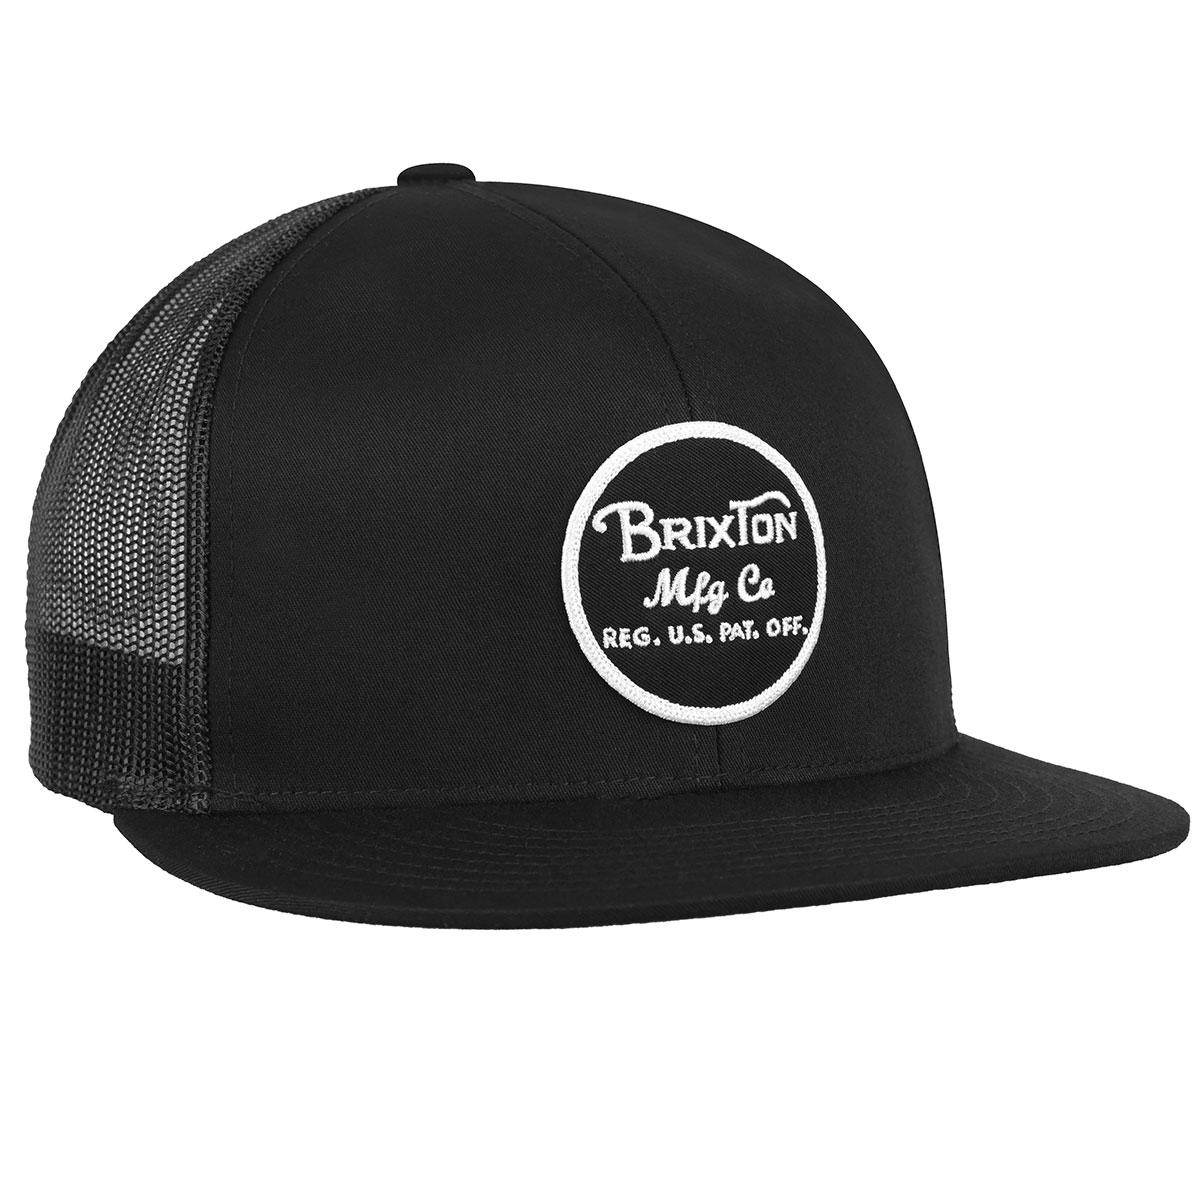 Brixton Wheeler Mesh Cap in Black,Black